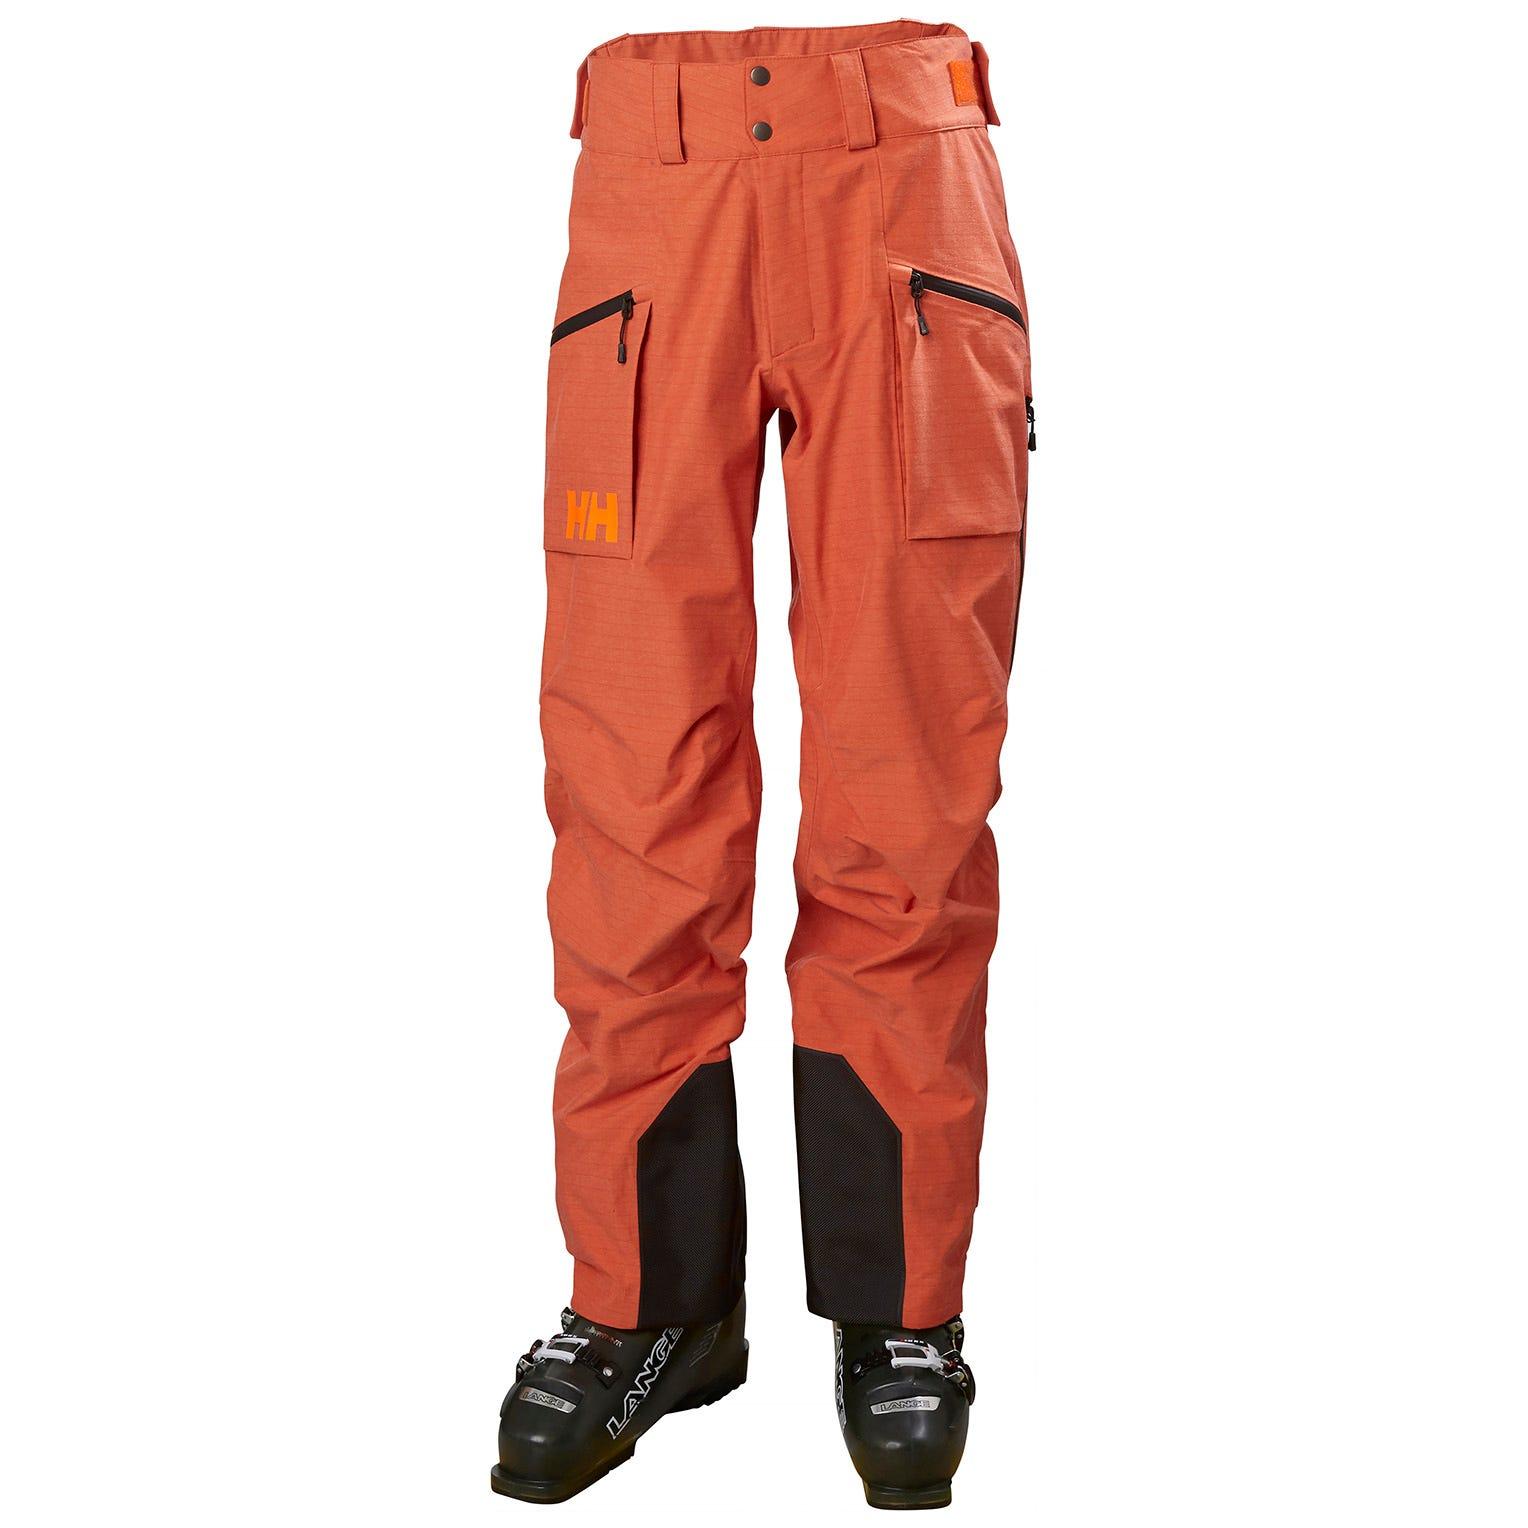 Helly Hansen Mens Elevation Shell 3.0 Ski Trouser XL